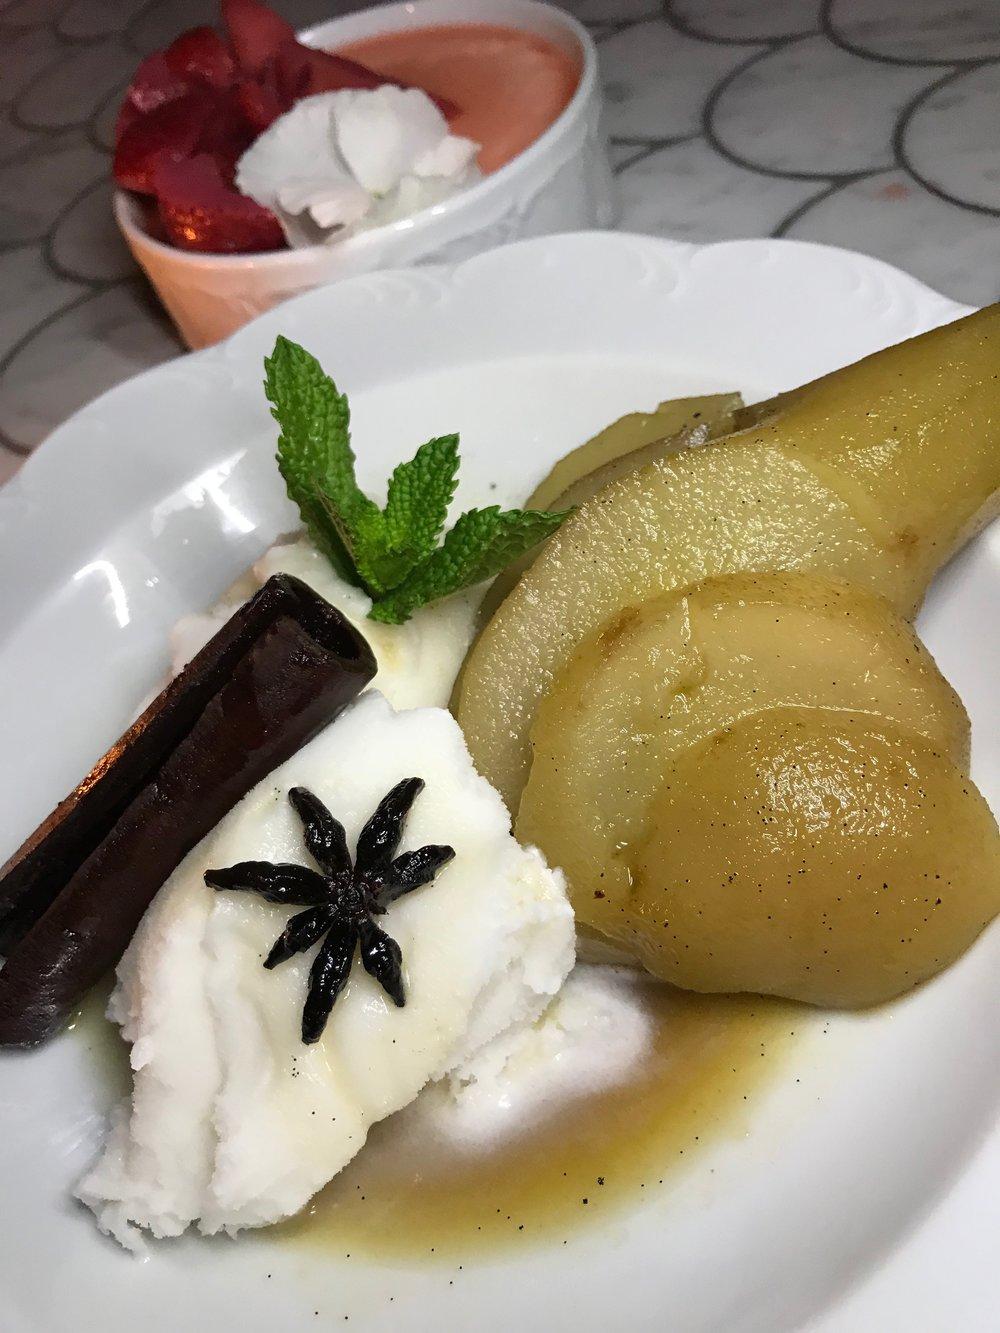 Vainilla & Brandy Poached Pear